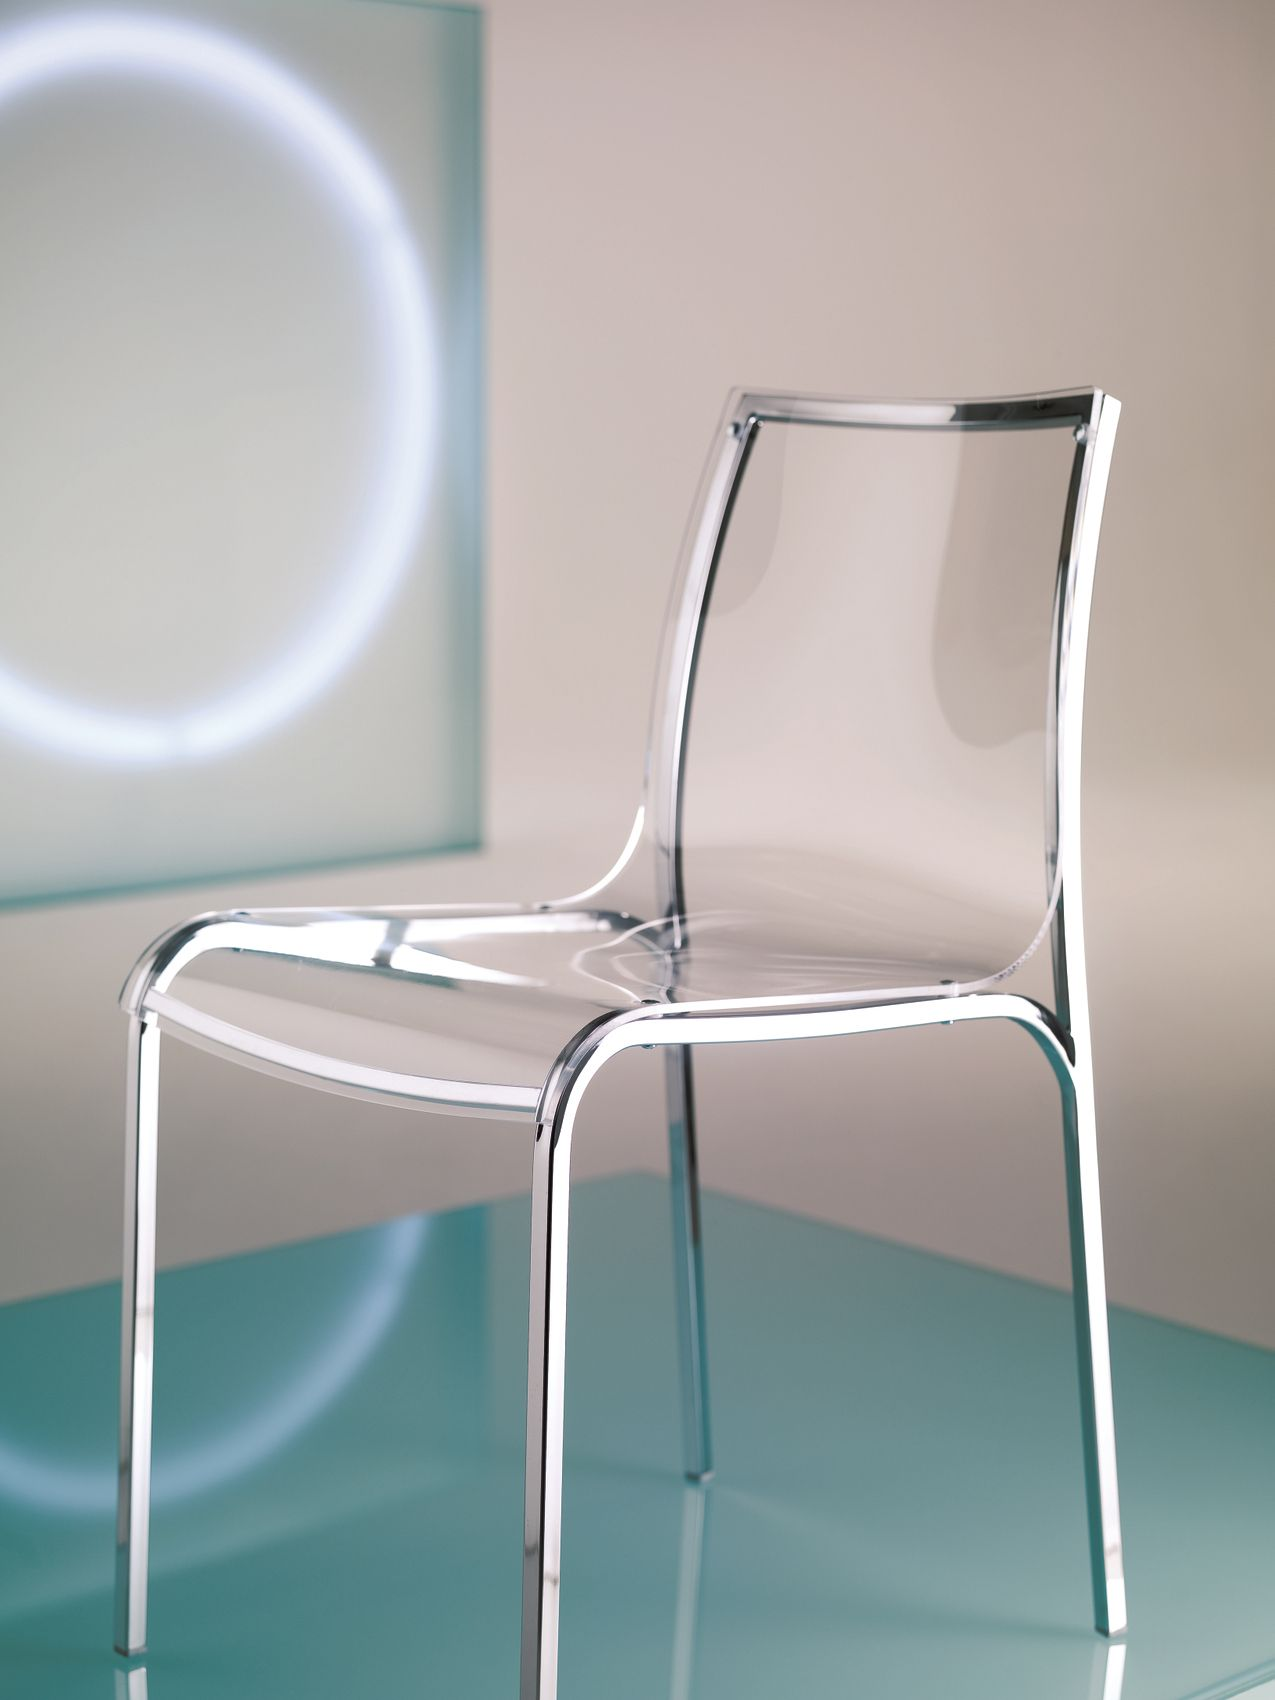 Cadeira de vidro acrlico YOGA by Bontempi Casa design Daniele Molteni